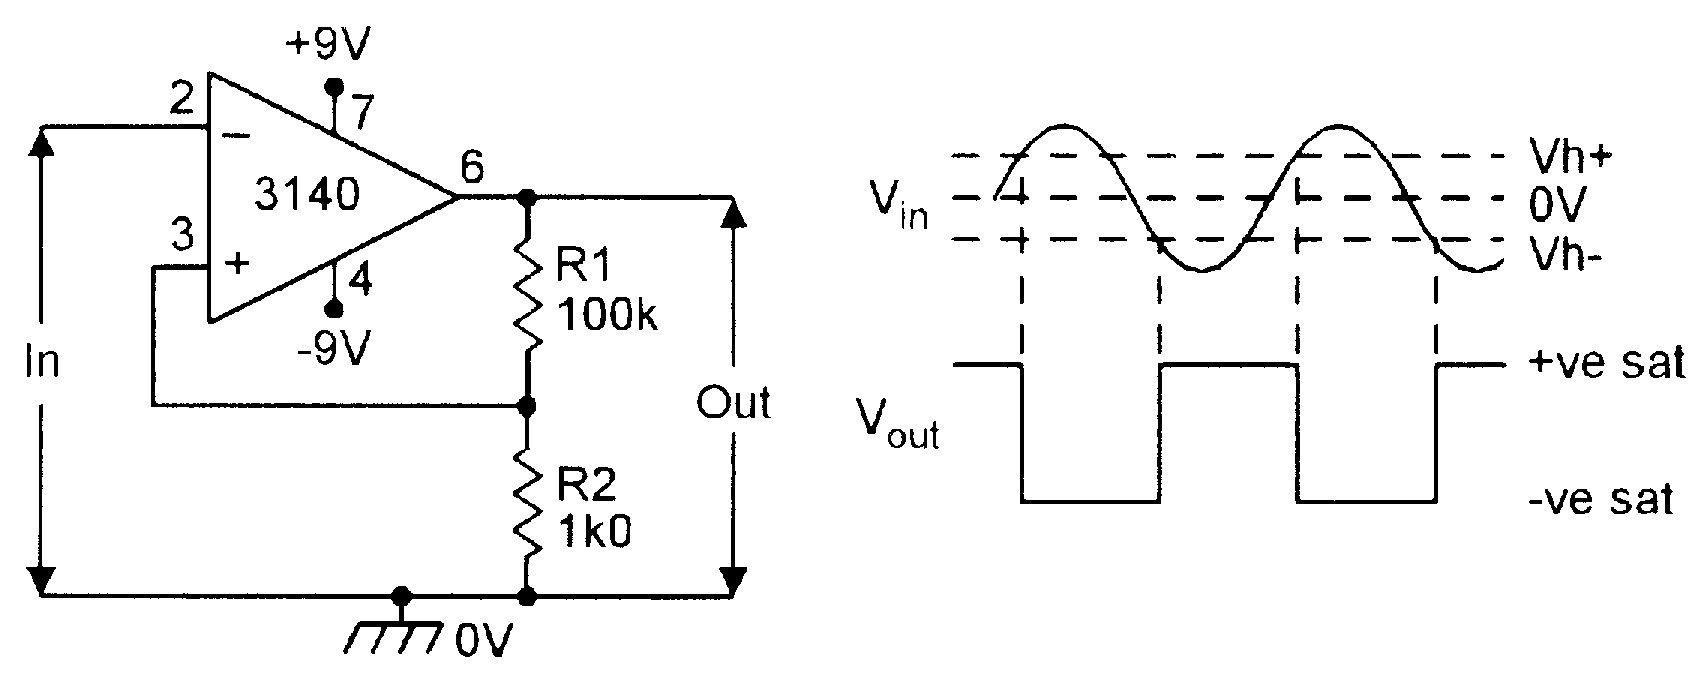 Schmitt Trigger Electronic Schematics Pinterest 555 Timer Circuit Key Code Lock Function Generator Electronics Projects